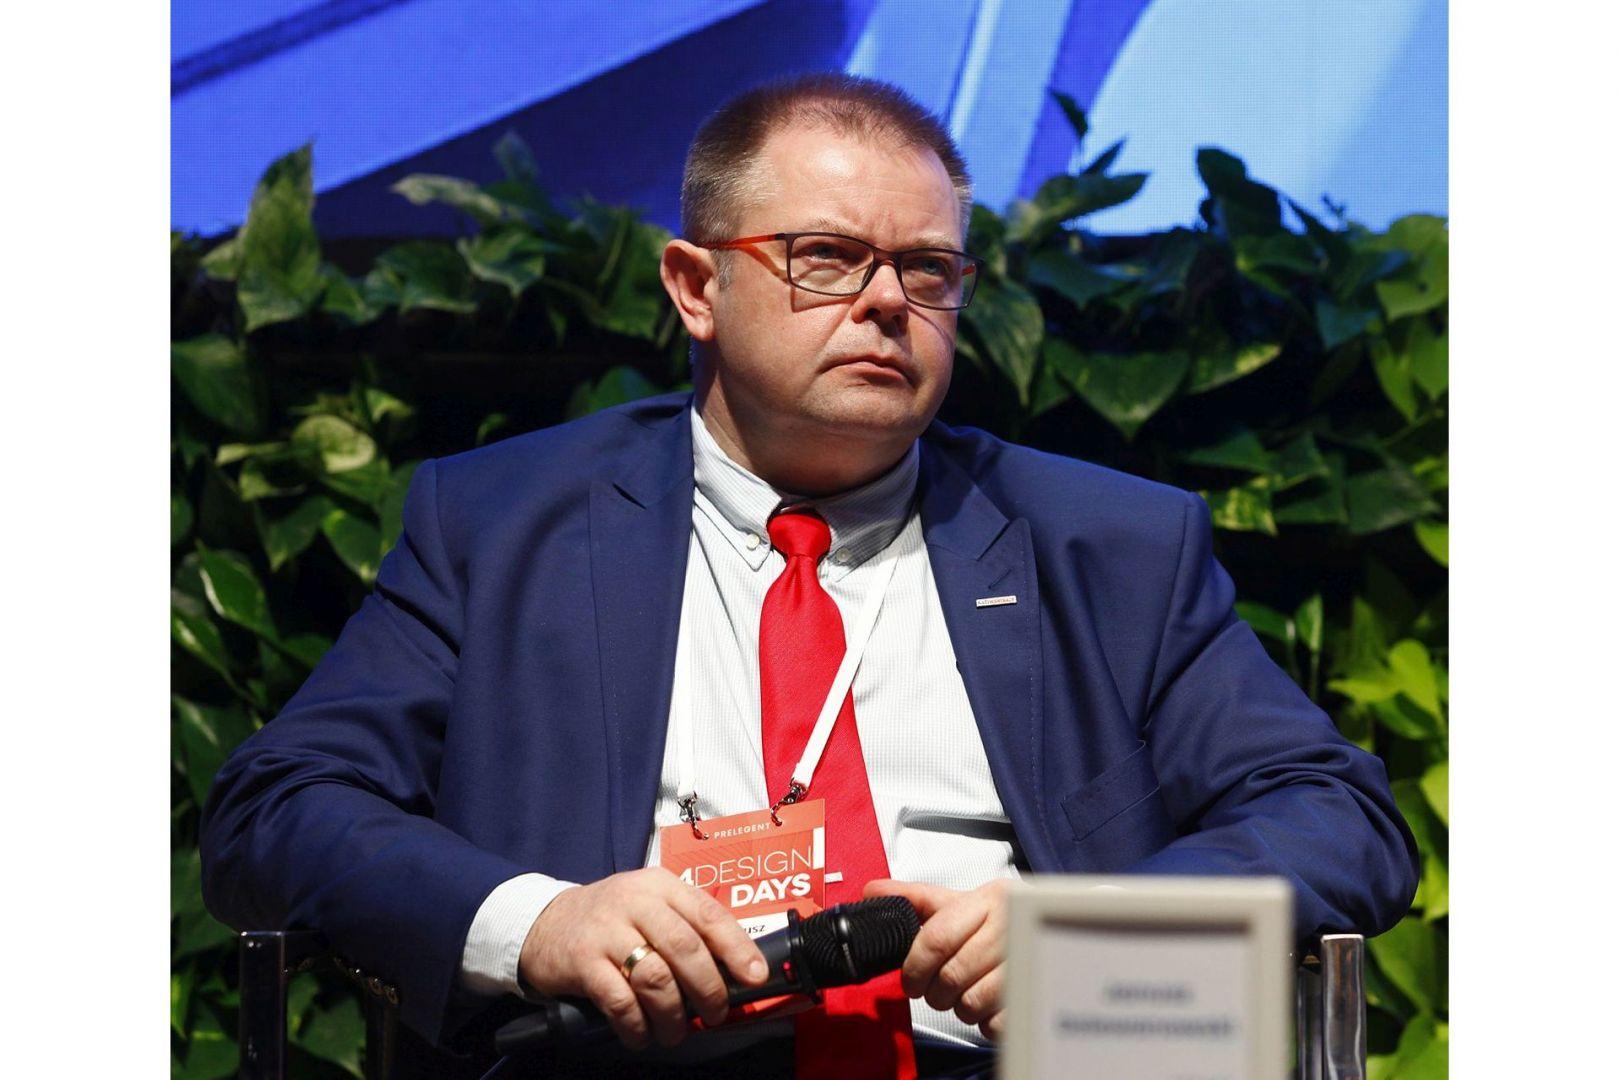 Janusz Dziewanowski, Business Development Manager, MultiContract Sp. z o.o. Fot. PTWP